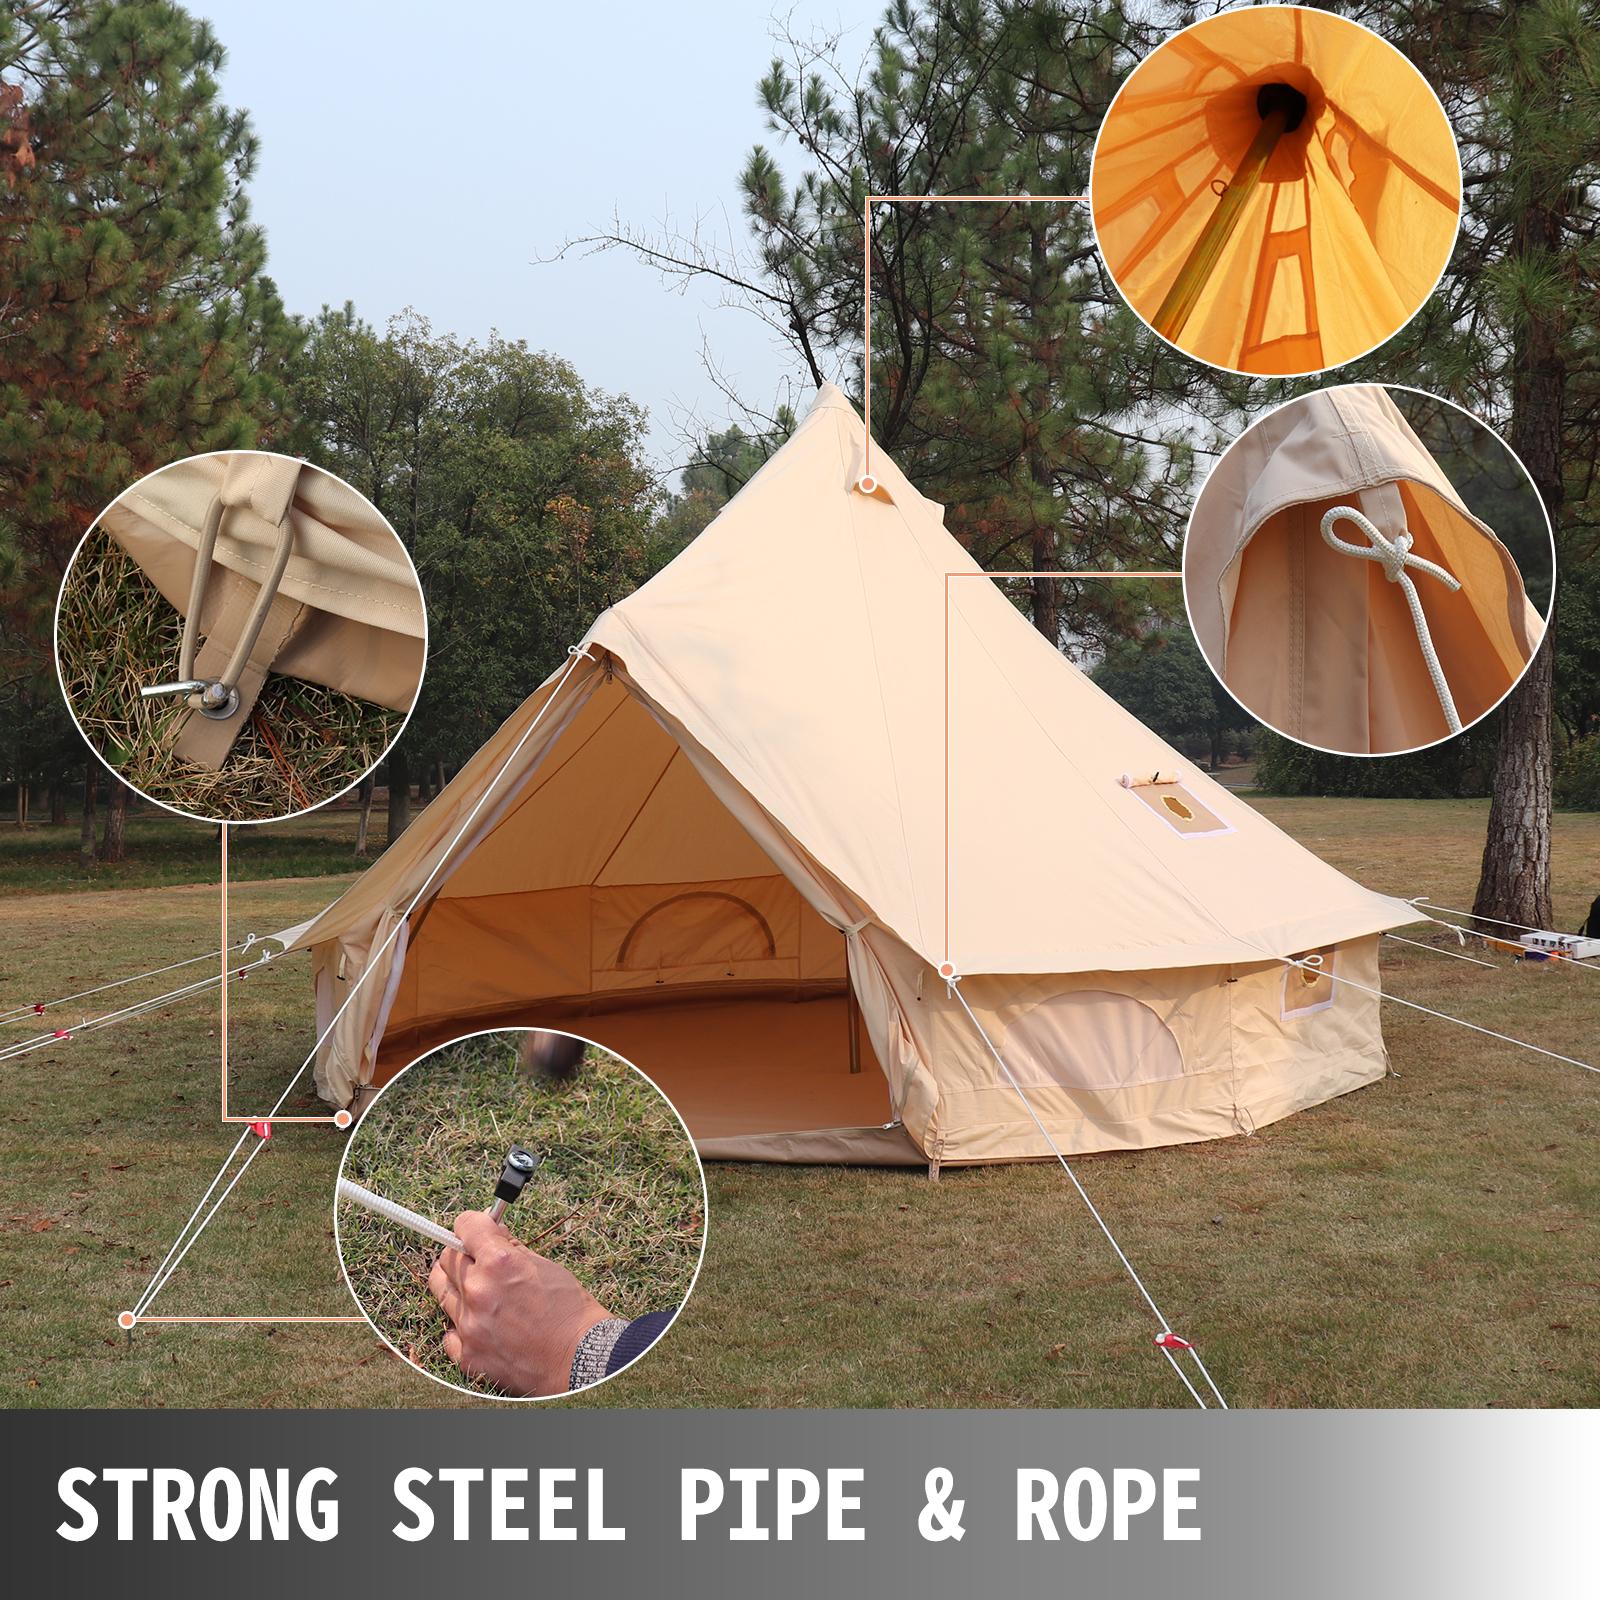 4-Season-Bell-Tent-3-4-5-6M-Waterproof-Cotton-Canvas-Glamping-Camping-Beach-US thumbnail 53